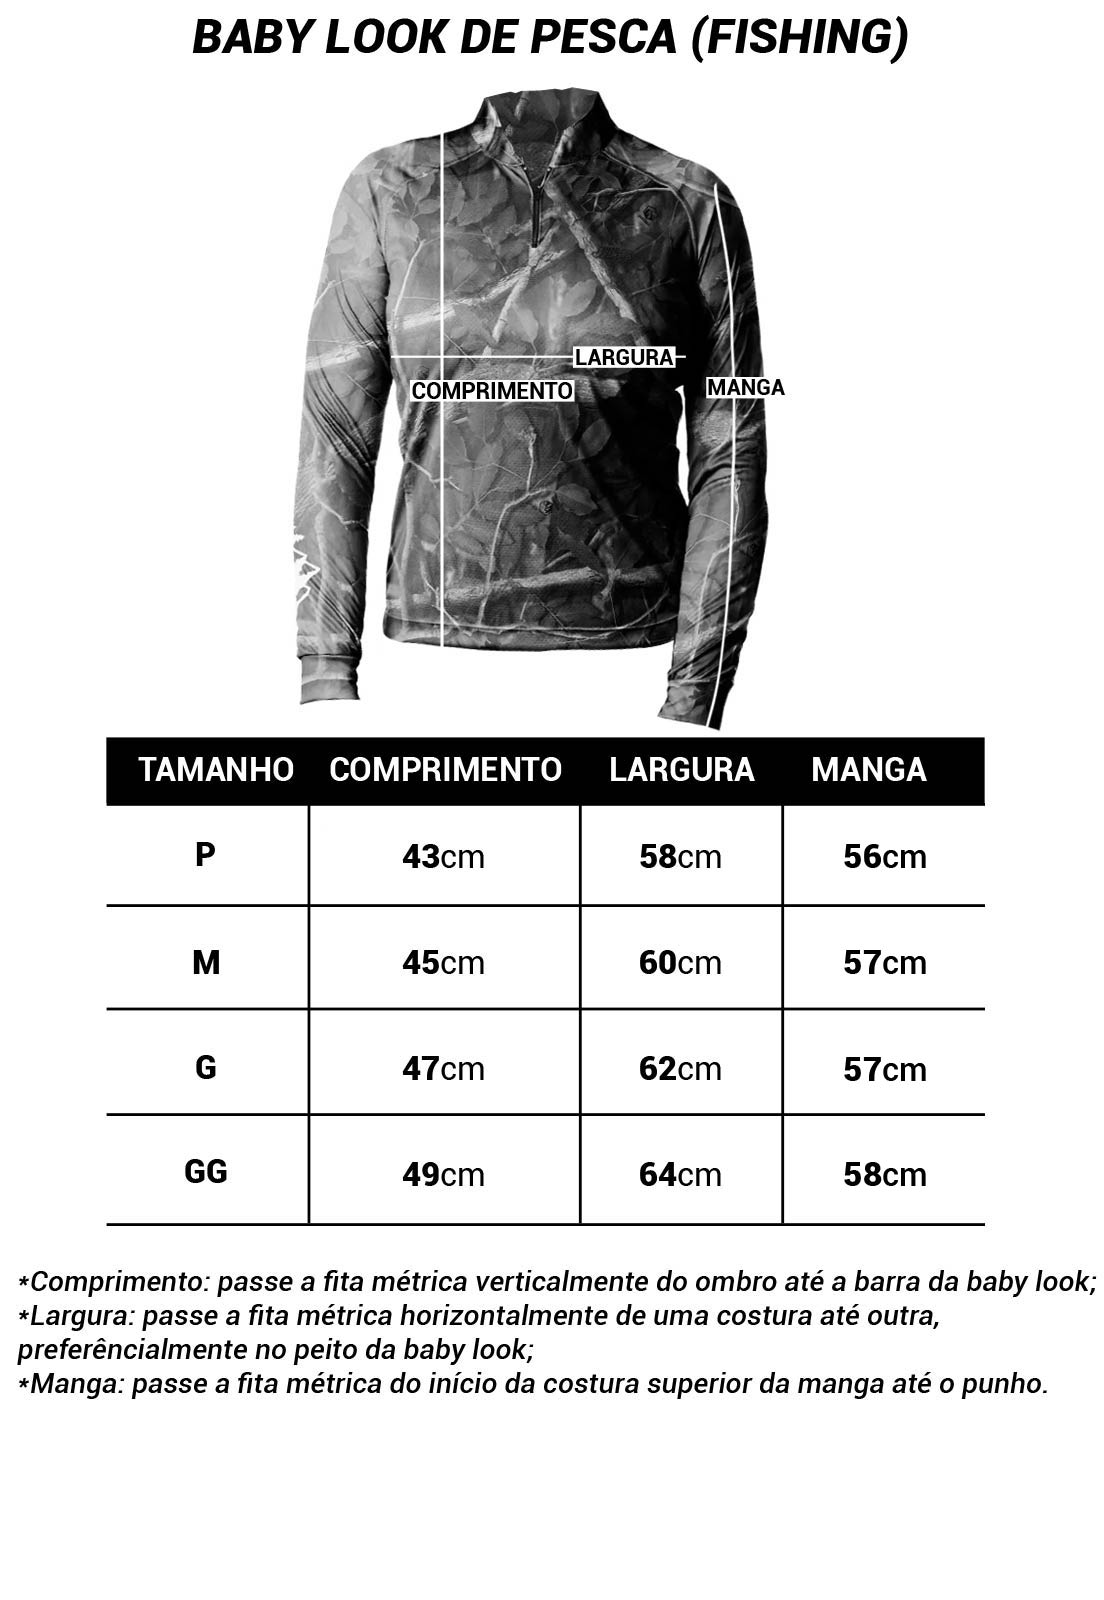 CAMISA DE PESCA FISH TECH PRO 01 FEMININA + BANDANA GRÁTIS  - Real Hunter